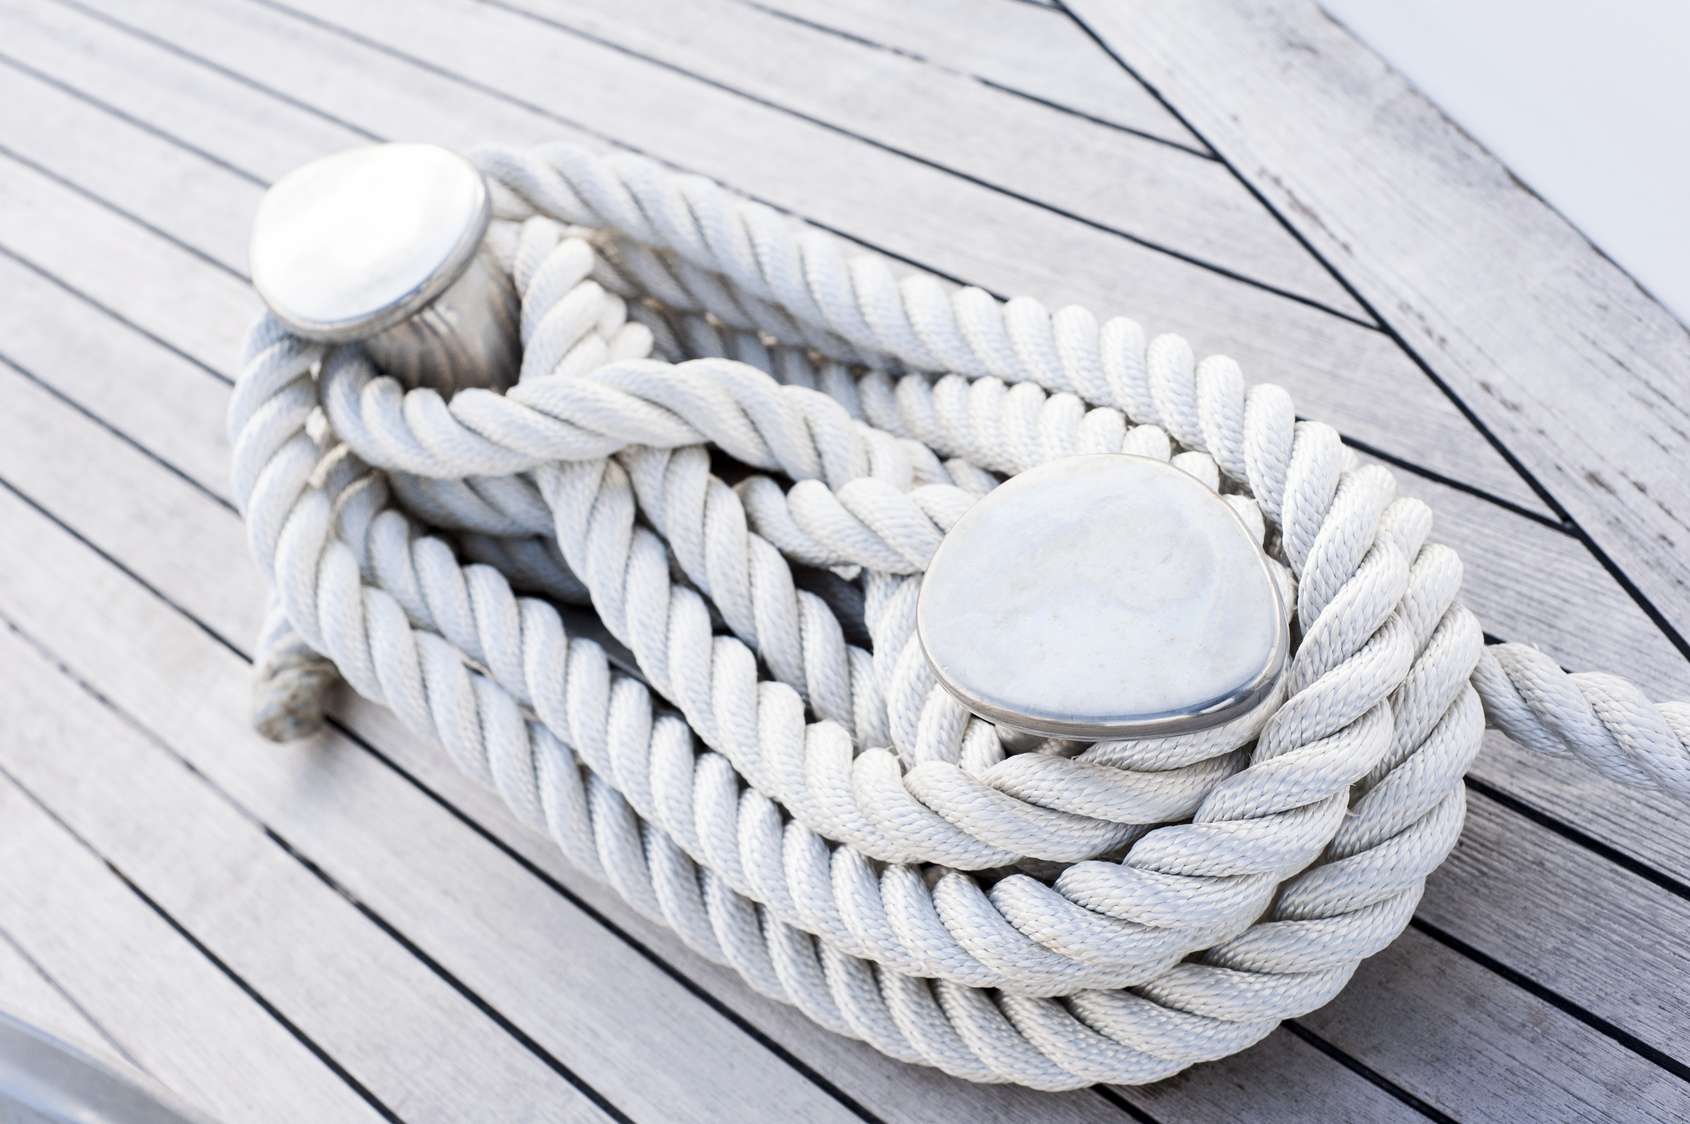 Corda legata